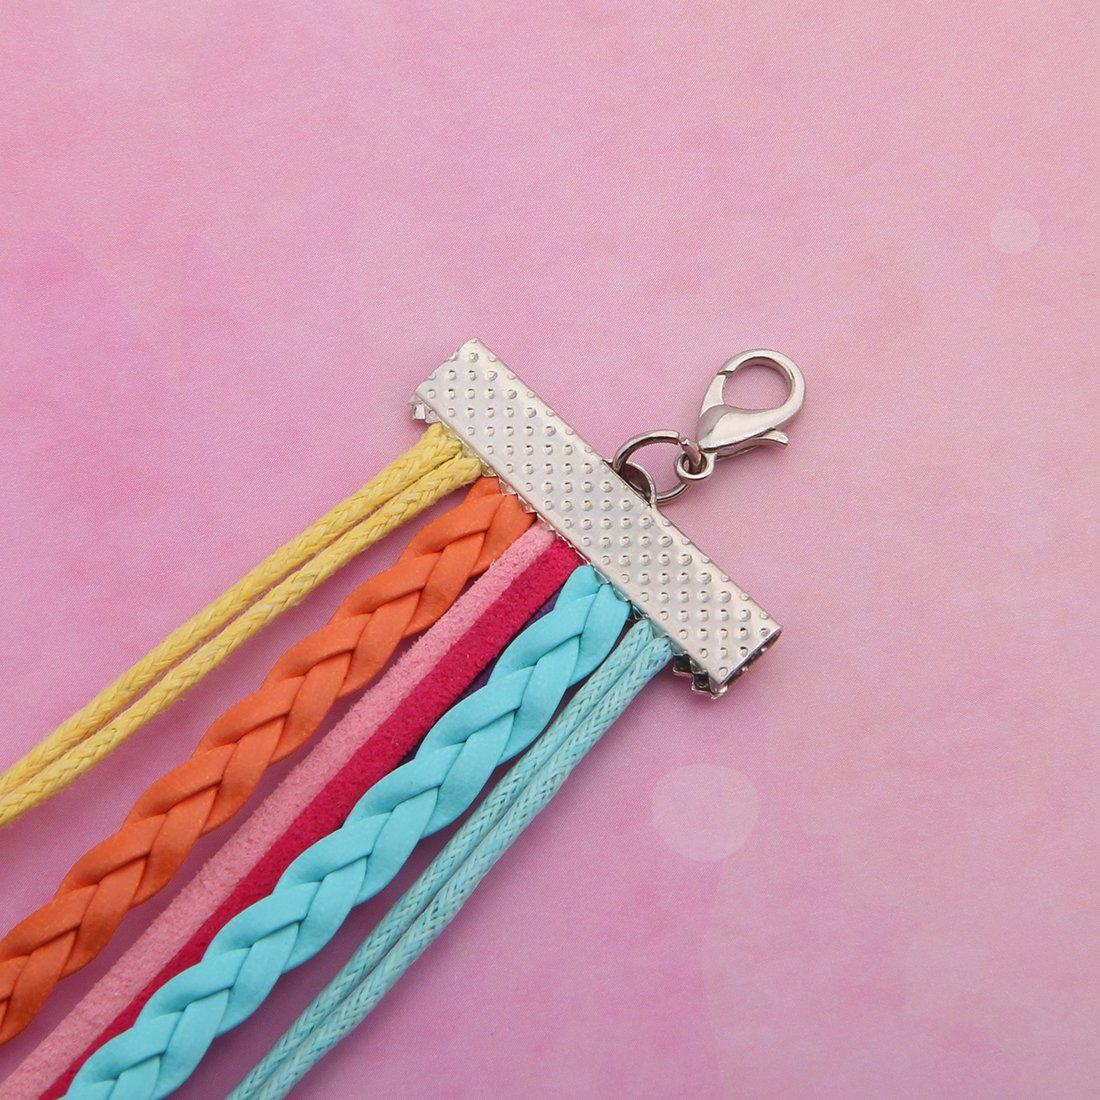 WUSUANED Infinity Love Rainbow Unicorn Bracelet Wristband Leather Rope Bracelet Horse Unicorn Lover Jewelry Gift for Women Girls